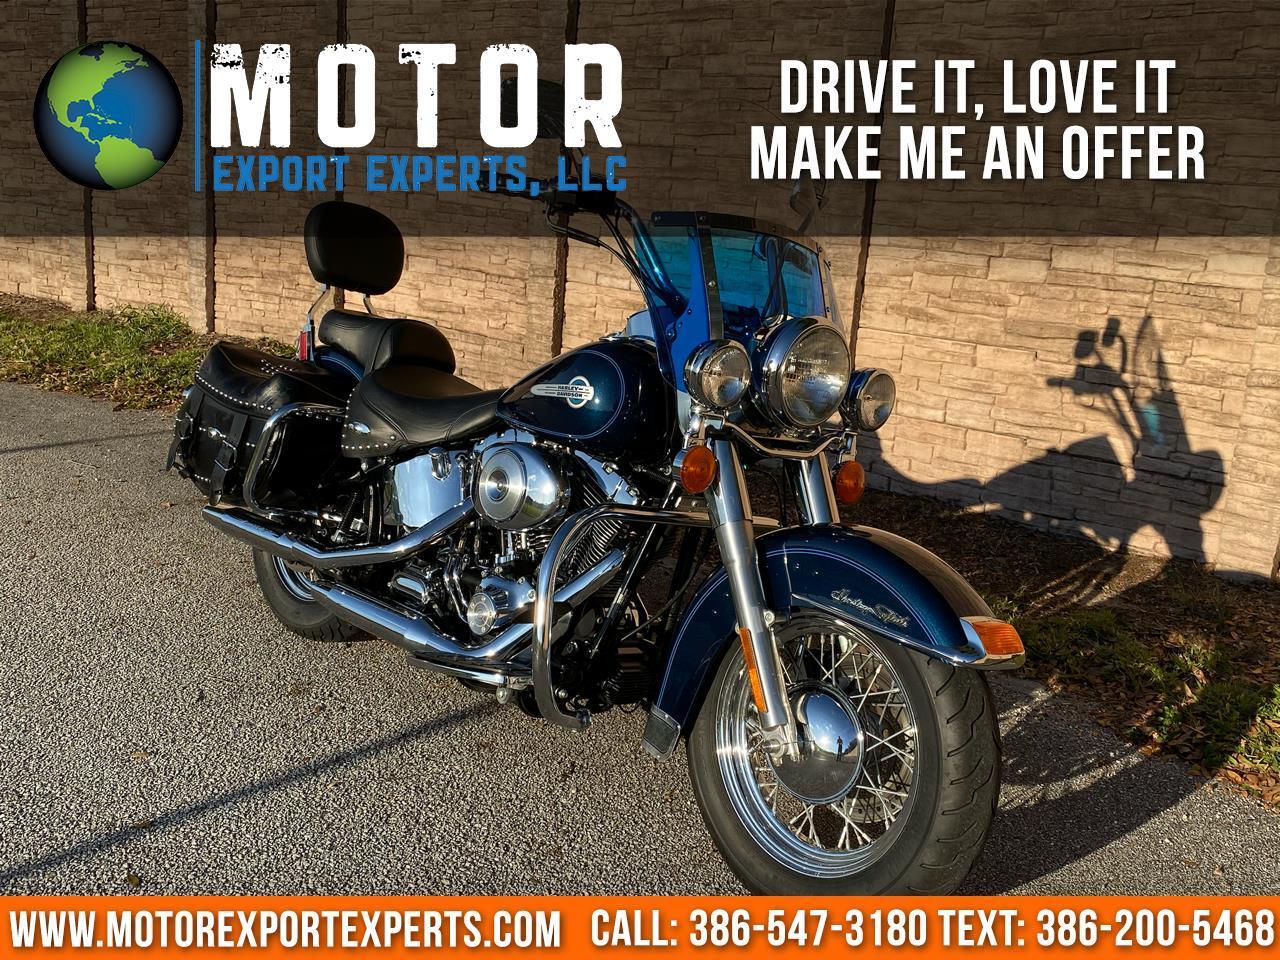 2002 Harley-Davidson FLSTC HERITAGE CLASSIC